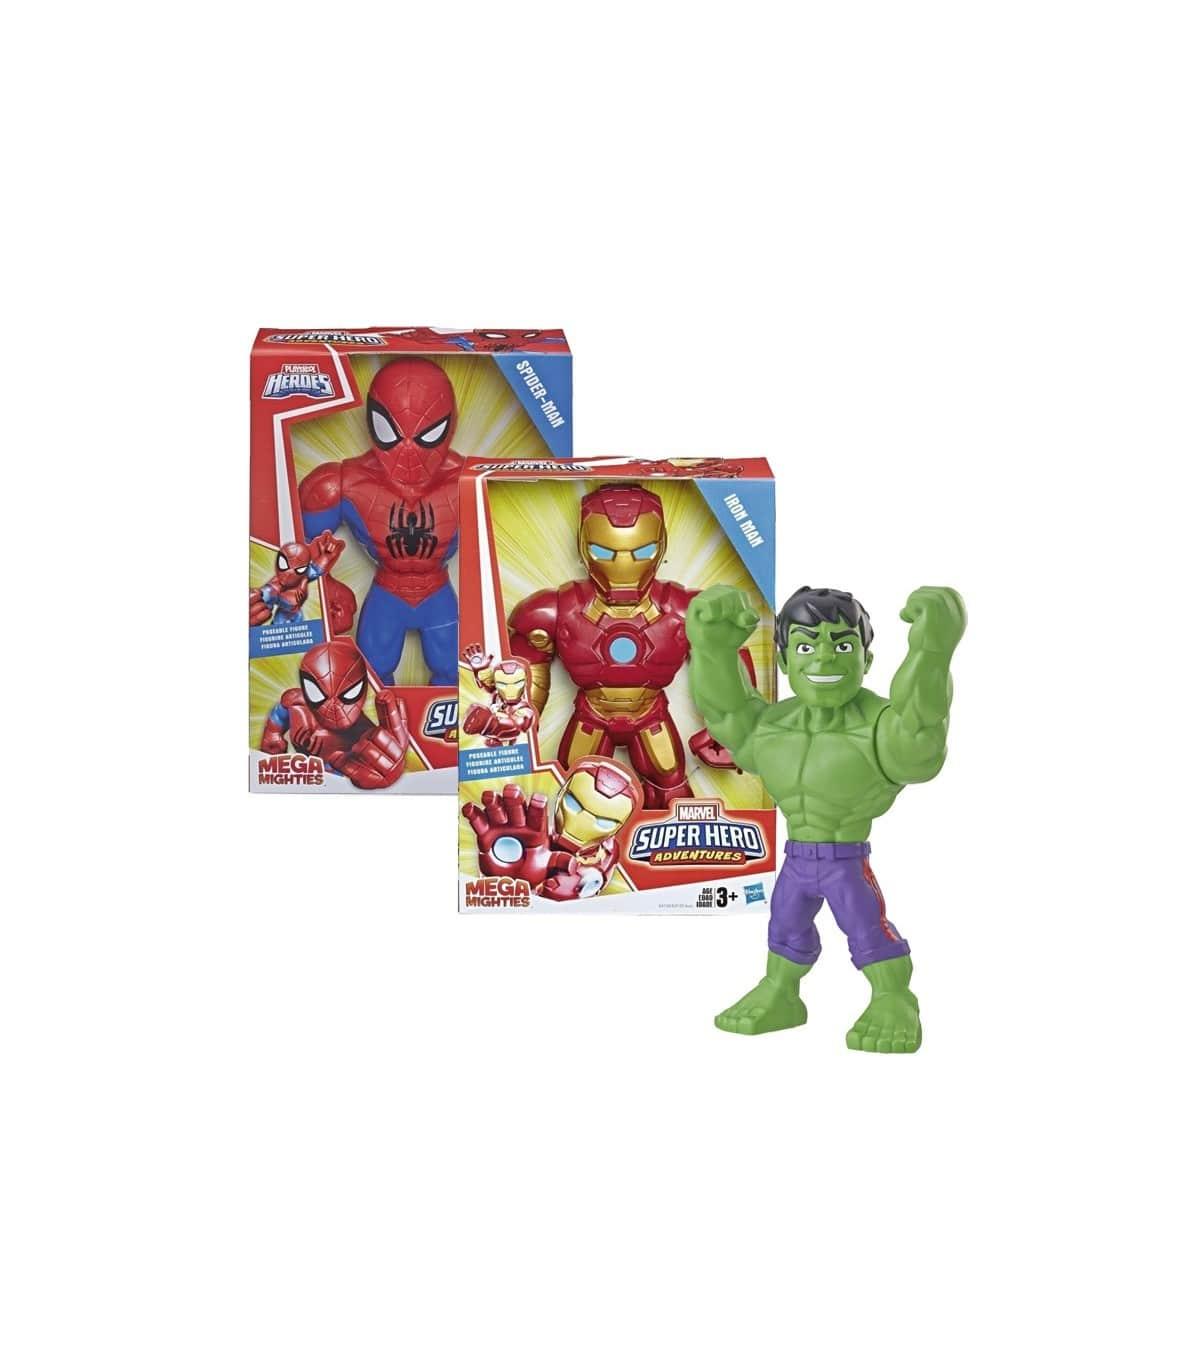 Figura Mega Mighties Super Heroe E4132 Avengers Hasbro